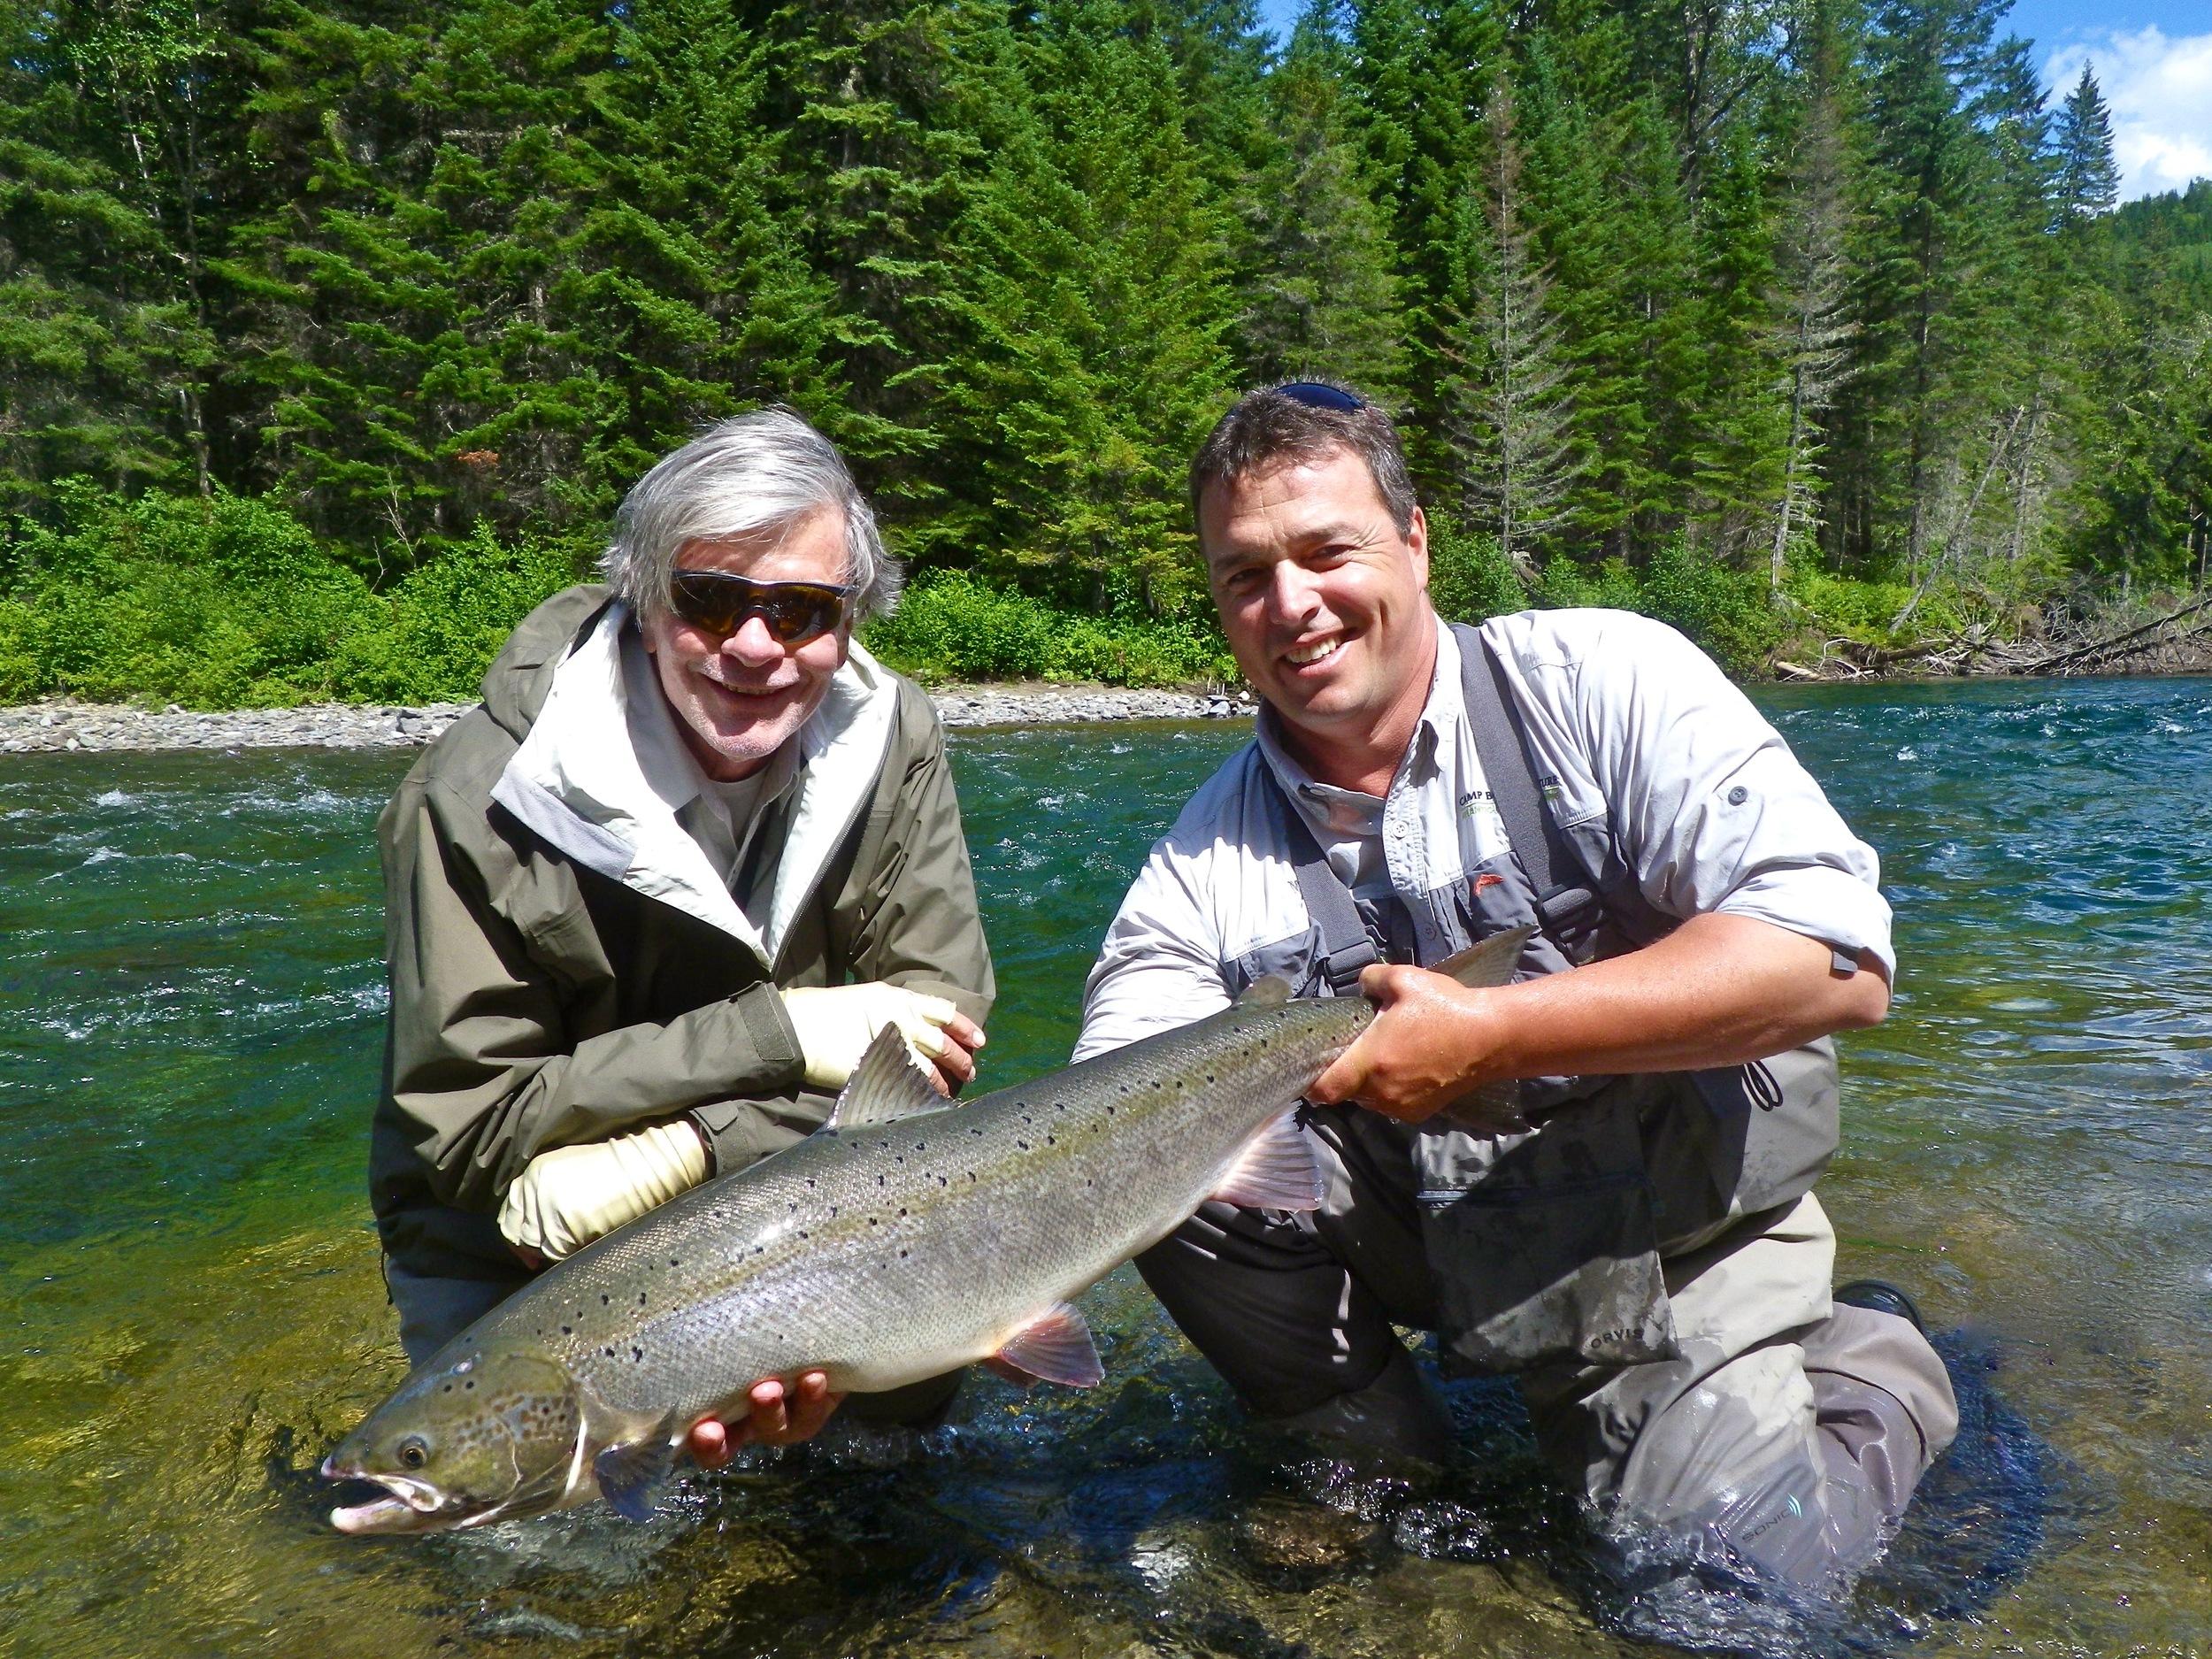 Stewart Seibensand Camp Bonaventure guide Matt Flowers, Nice fish Stewart!